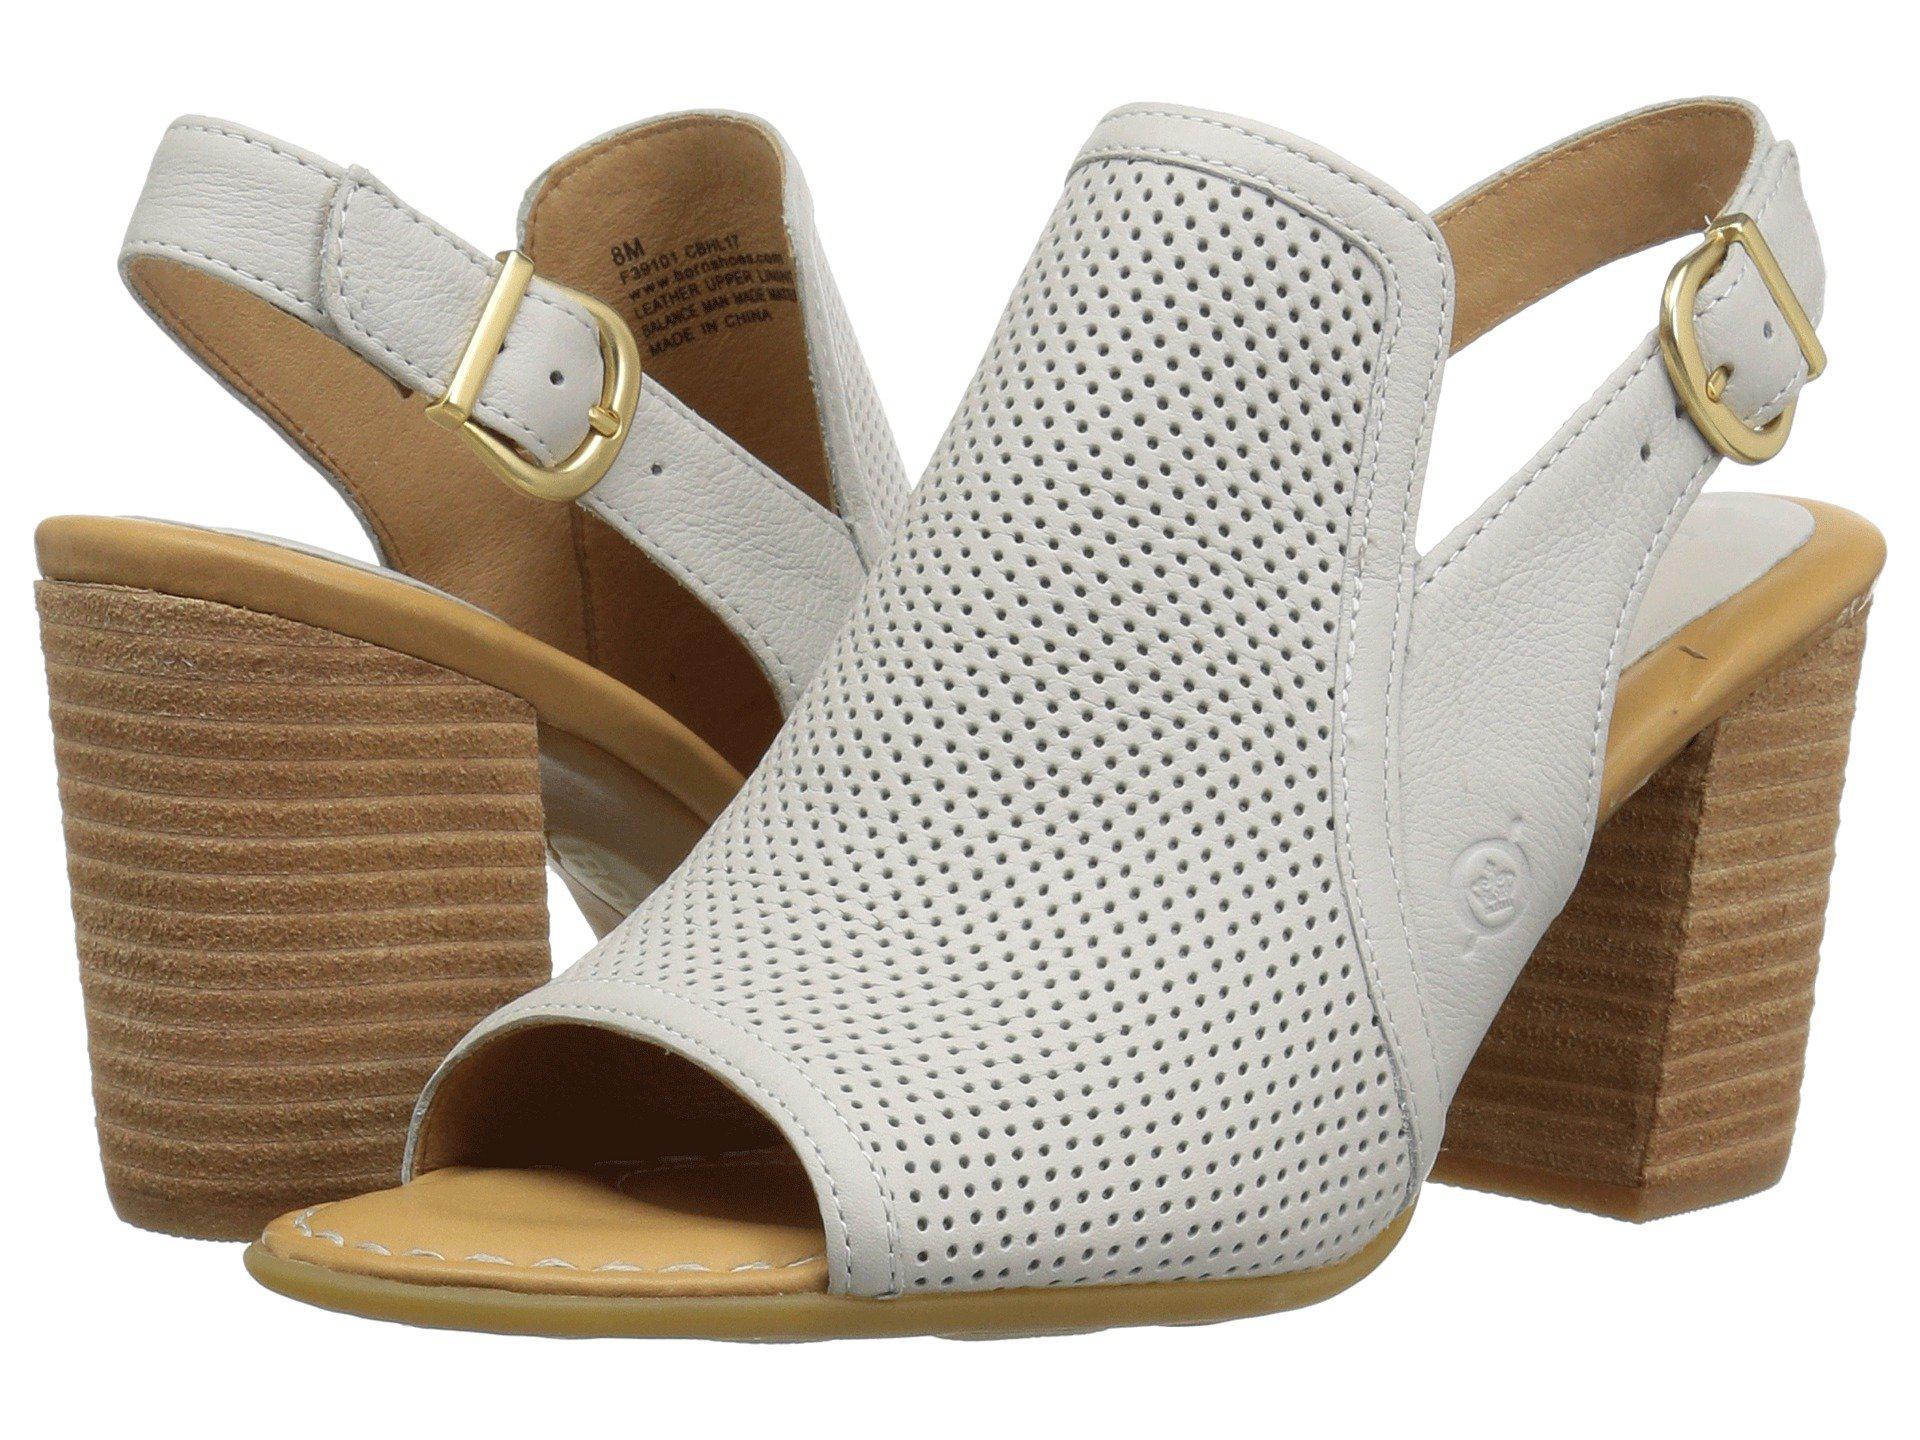 Sutra Perf Slingback Peep-Toe Block Heel Sandals yaOOx9O